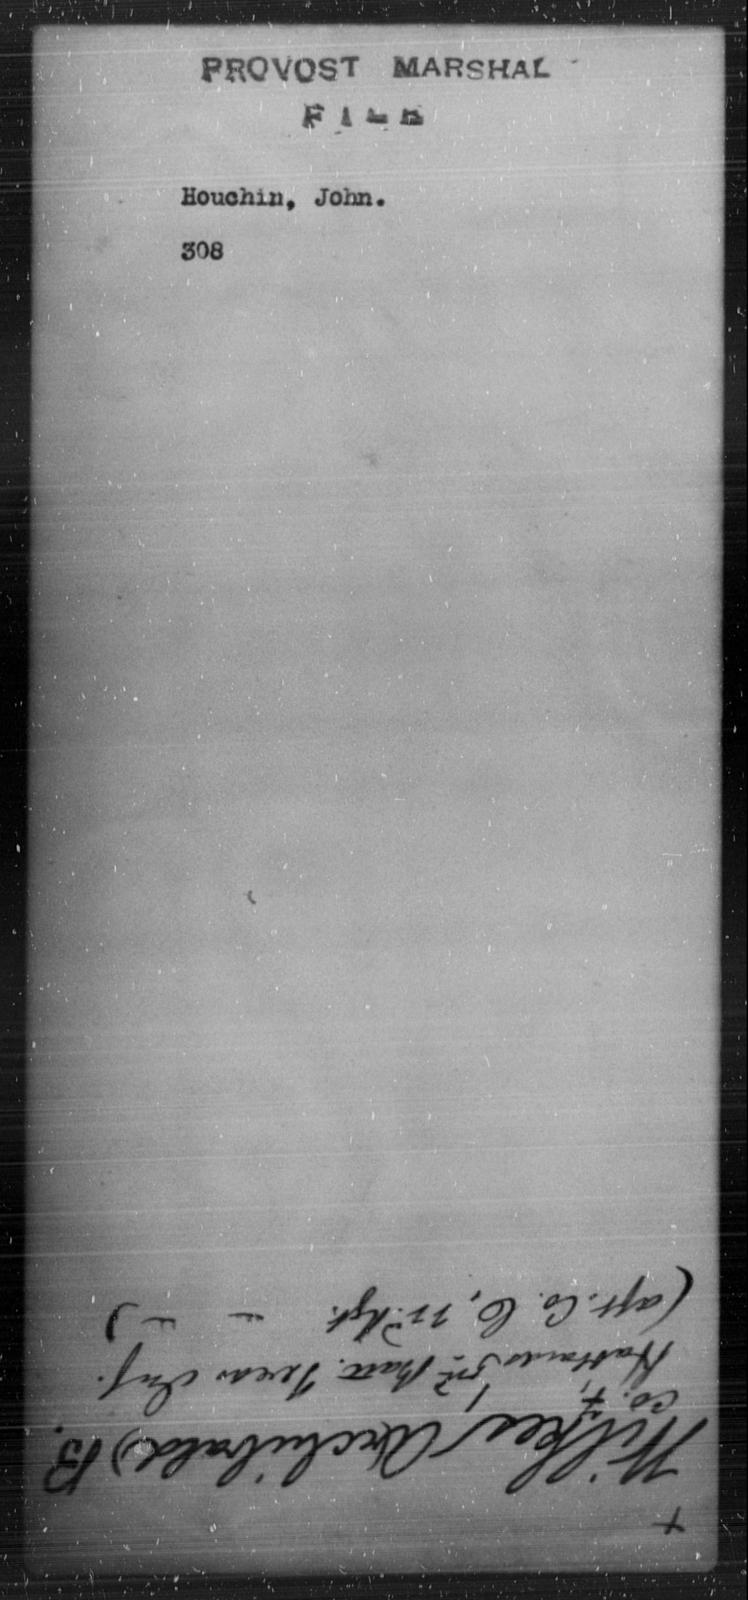 Houchin, John - State: [Blank] - Year: [Blank]